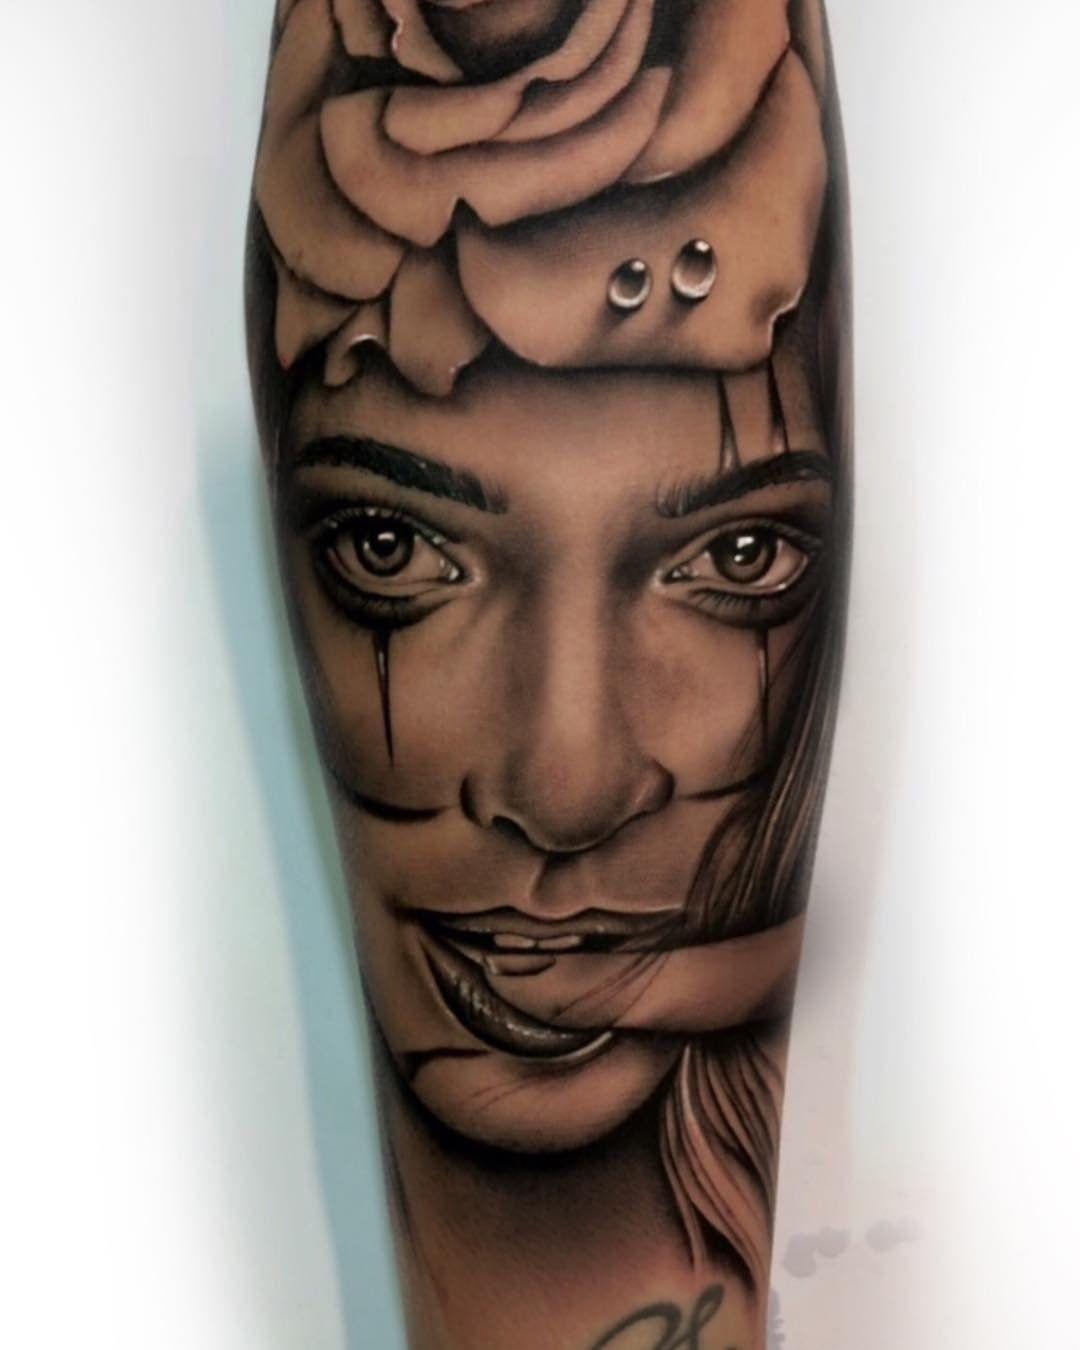 followforfollow,followmeciudadreal,ciudadreal,tomelloso,almagro,puertollano,tatuajesendaimiel,ciudadrealtattoo,ciudadrealtatuajes,tatuajesciudadreal,ciudadrealtatuajes,puertollano,ciudadreal,tattoos,ciudadrealtattoo,besttattooers,juantabasco,ciudadrealsetatua,ink,tatuajes,ciudadrealtattoo,tatuajesenpuertollano,traditionaltattoos,castillalamancha,ink,tattooart,daimiel,blackandgreytattoo,daimiel,blackandgreytattoo